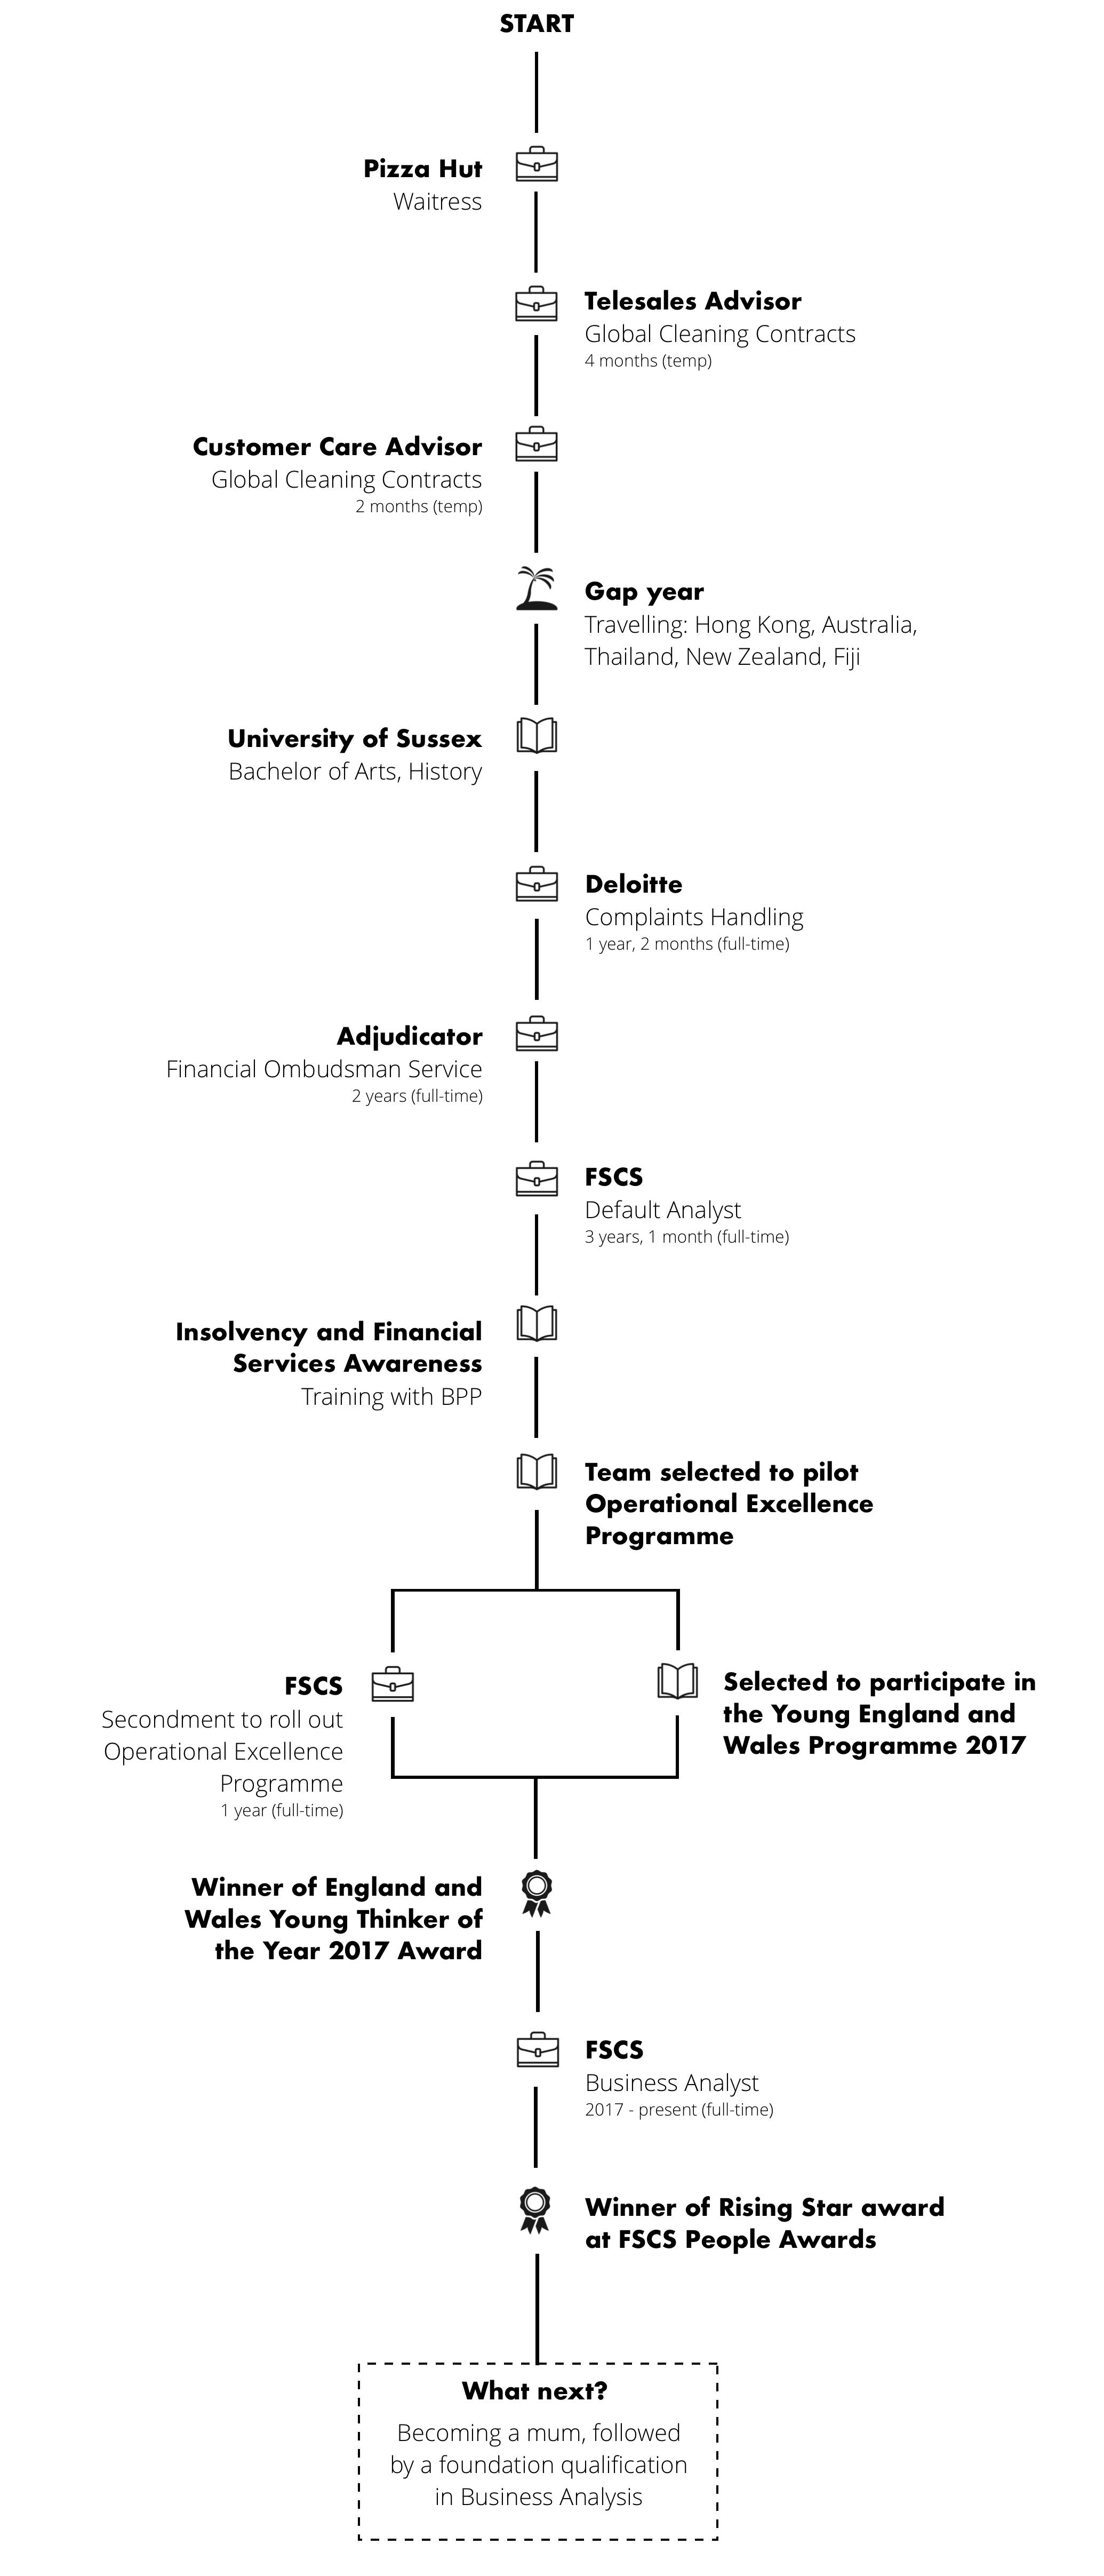 FSCS-renegade-generation-career-journey-map-emily-room.png